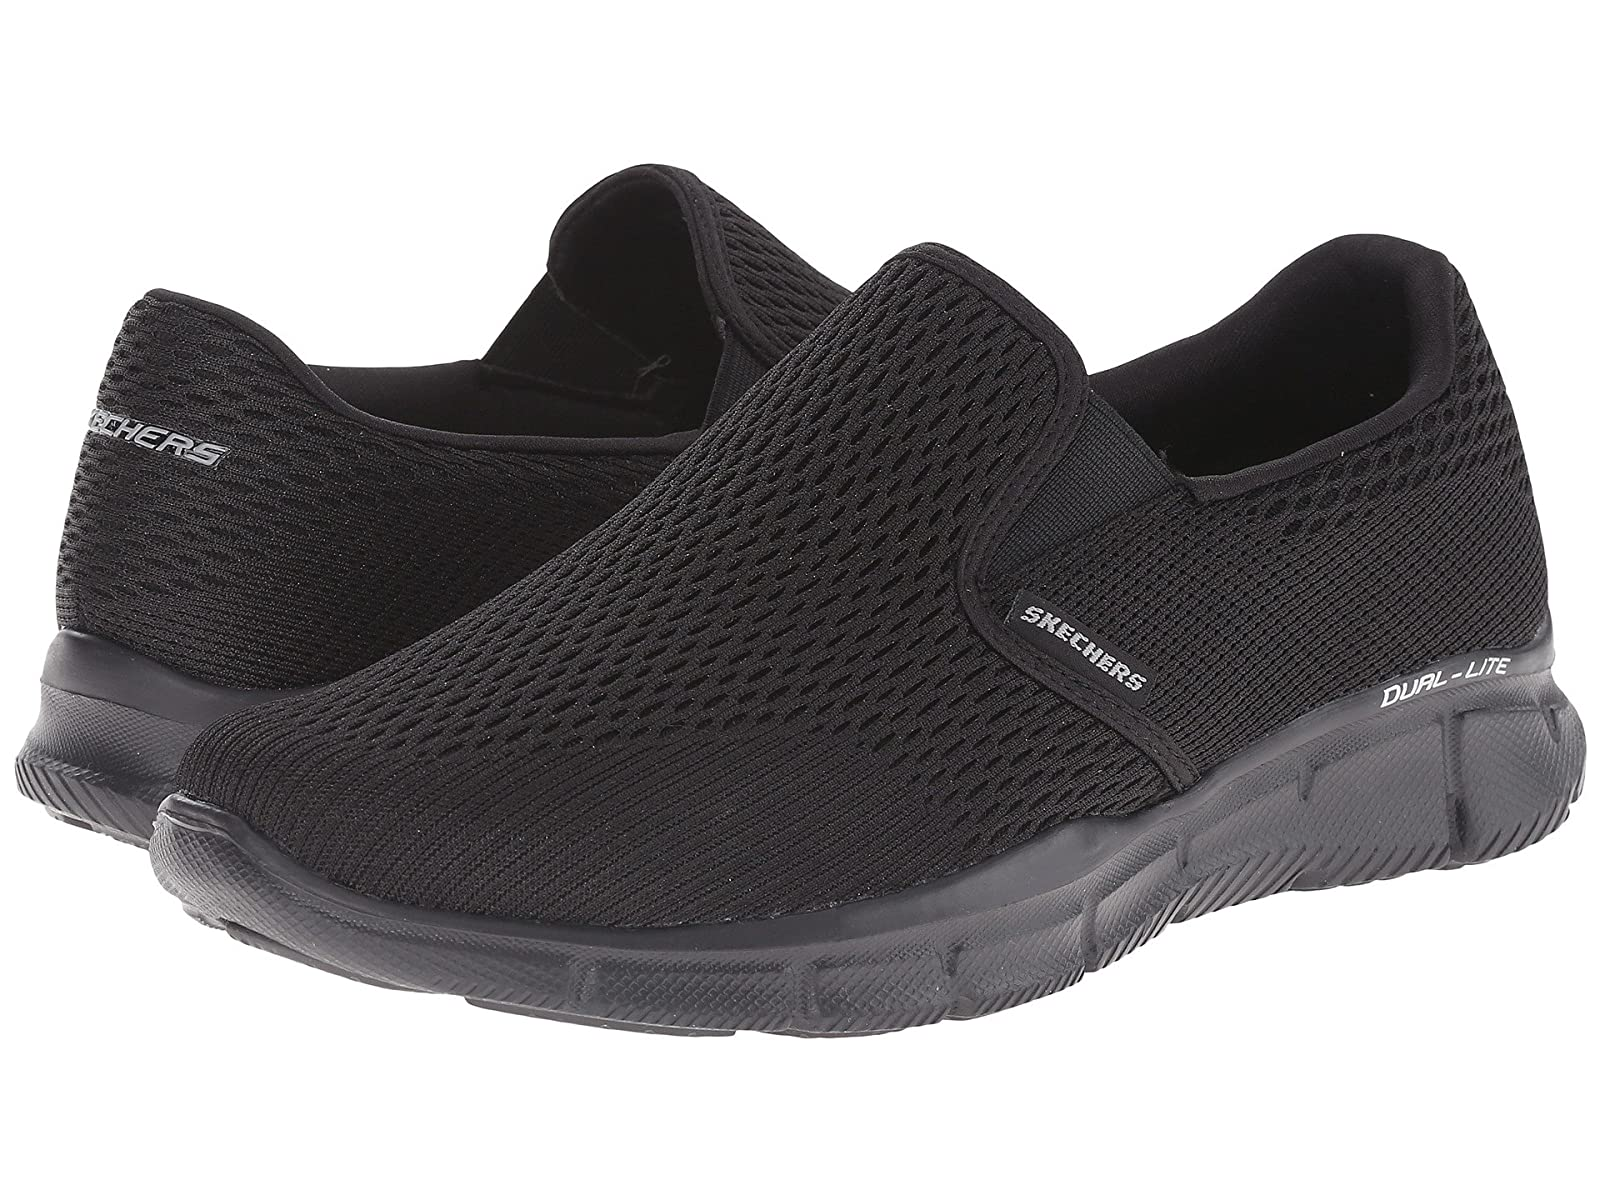 SKECHERS Equalizer Double PlayAtmospheric grades have affordable shoes